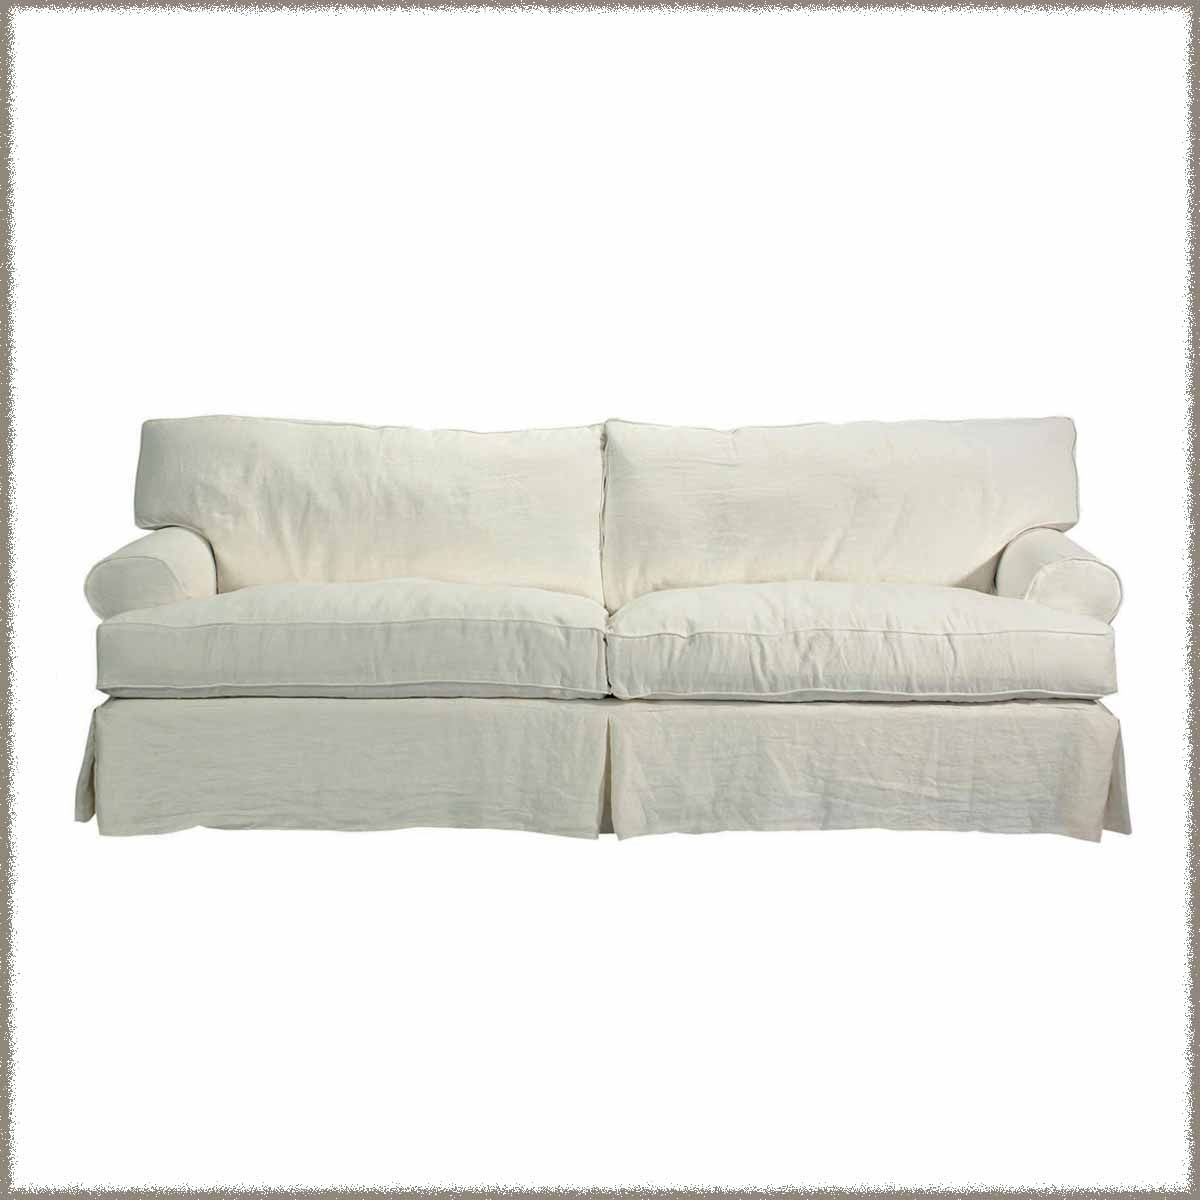 Slipcovered Sofa - Brand New